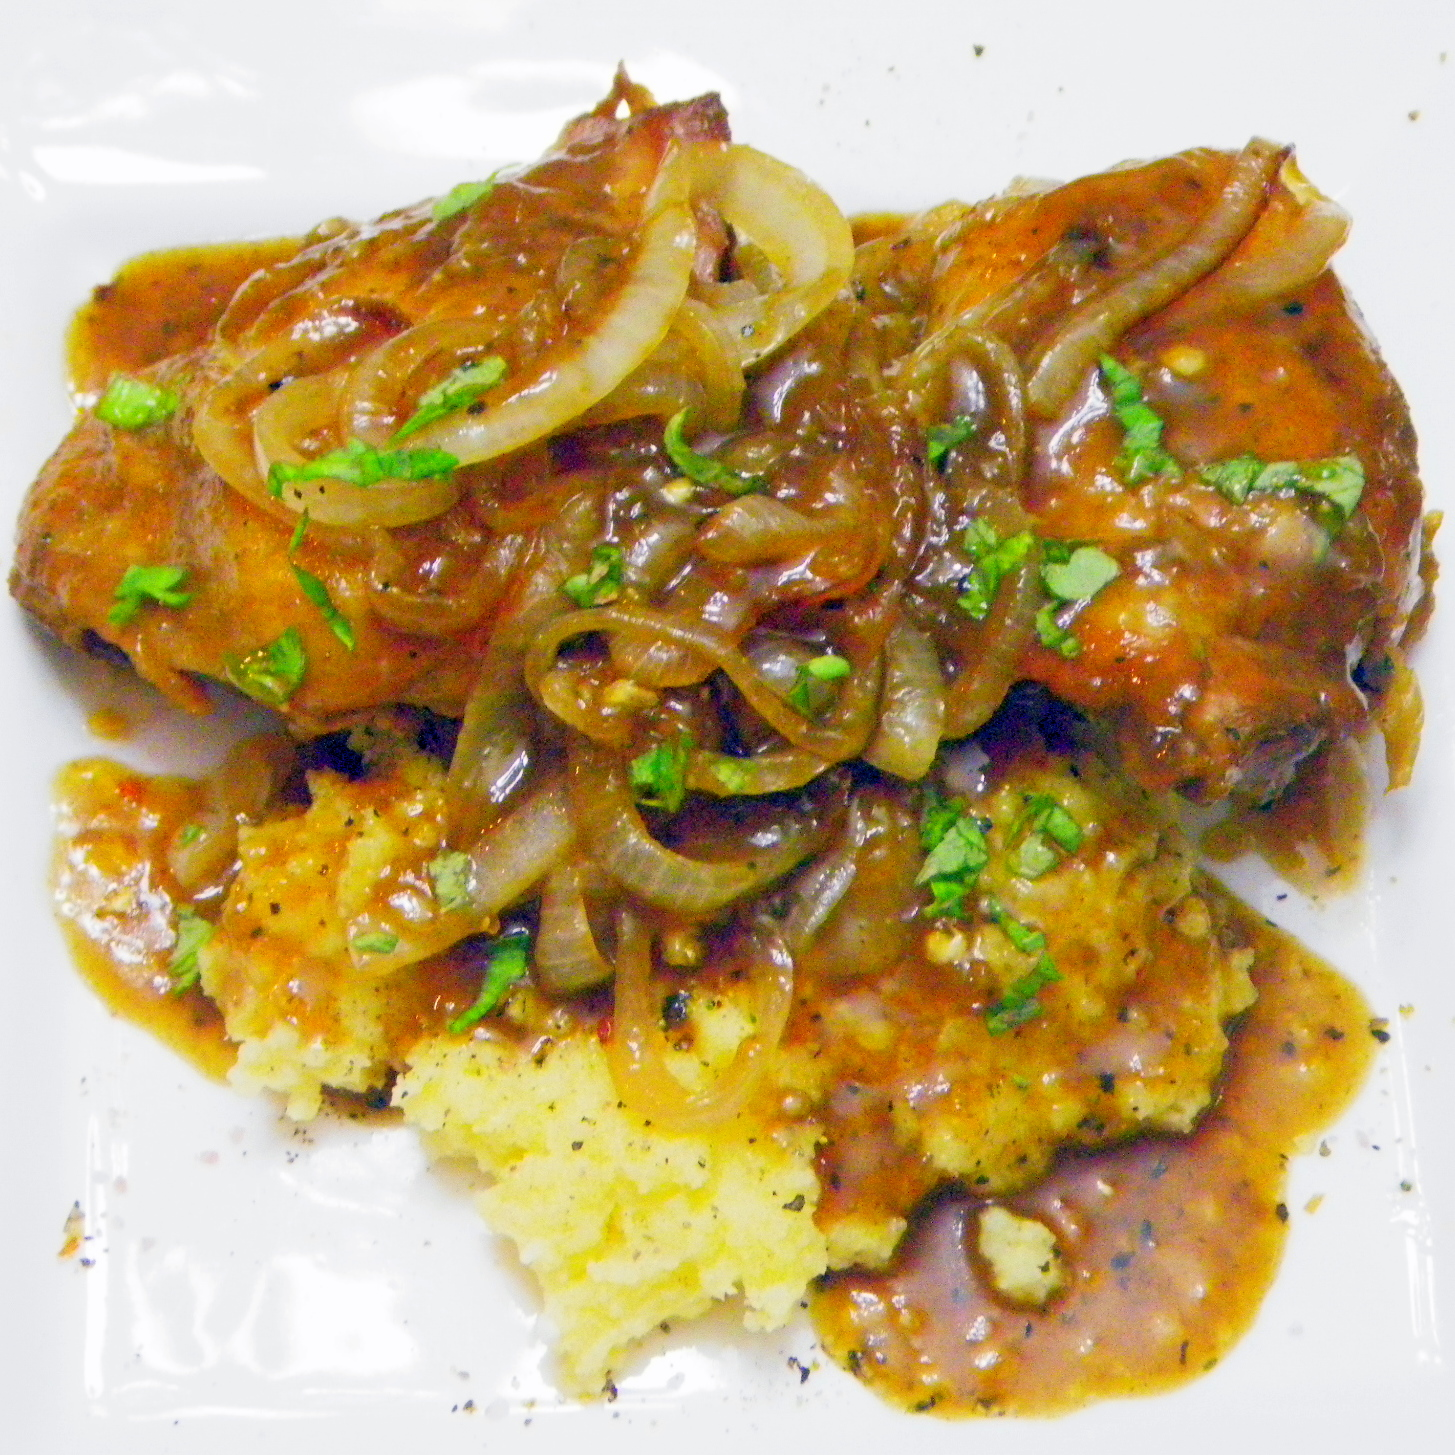 52 Ways To Cook: Version 2 Of Crock Pot Teriyaki Chicken